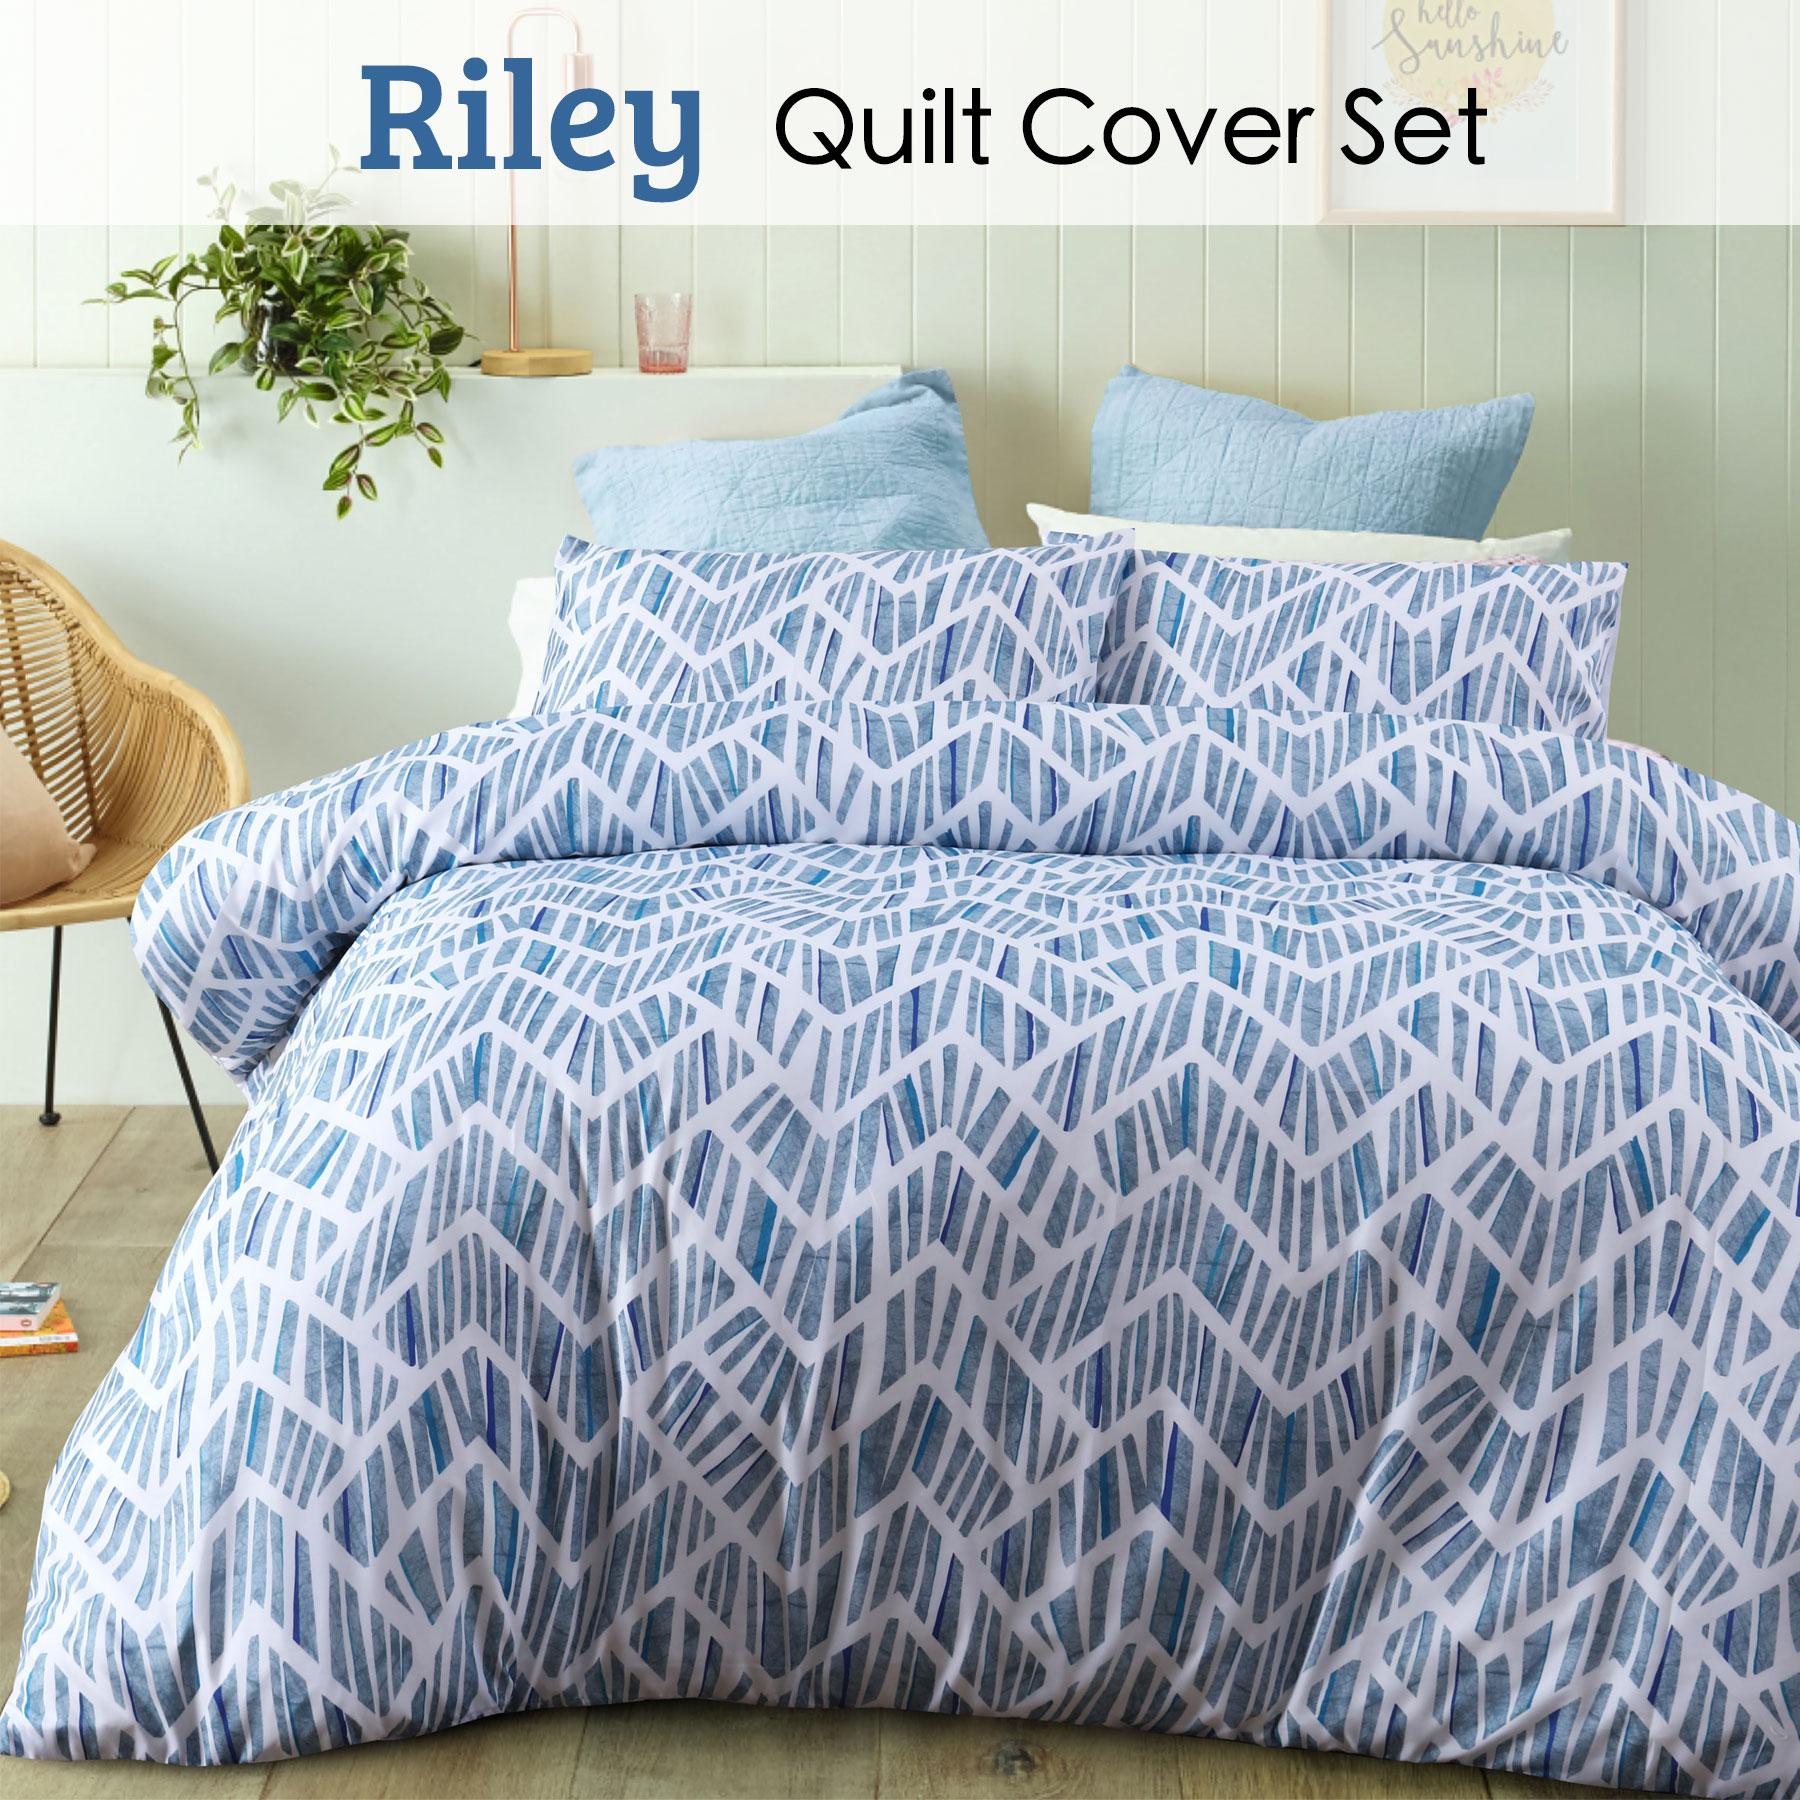 RILEY DUVET COVER SET LUXURY GEOMETRIC QUILT BEDDING BED LINEN PILLOWCASES SET